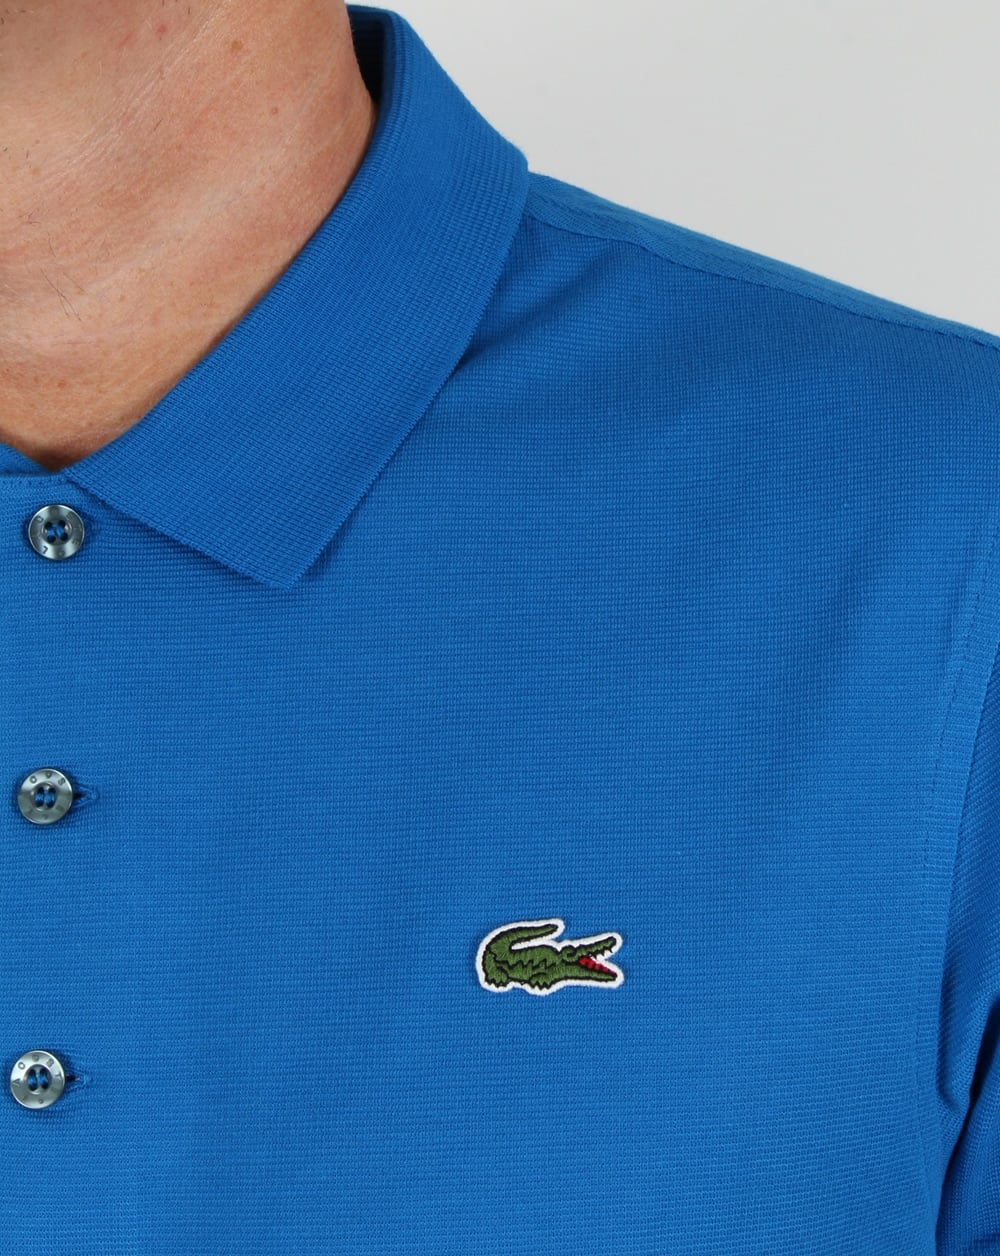 Lacoste Polo Shirt Ink Blue 5b92a9fed3b2